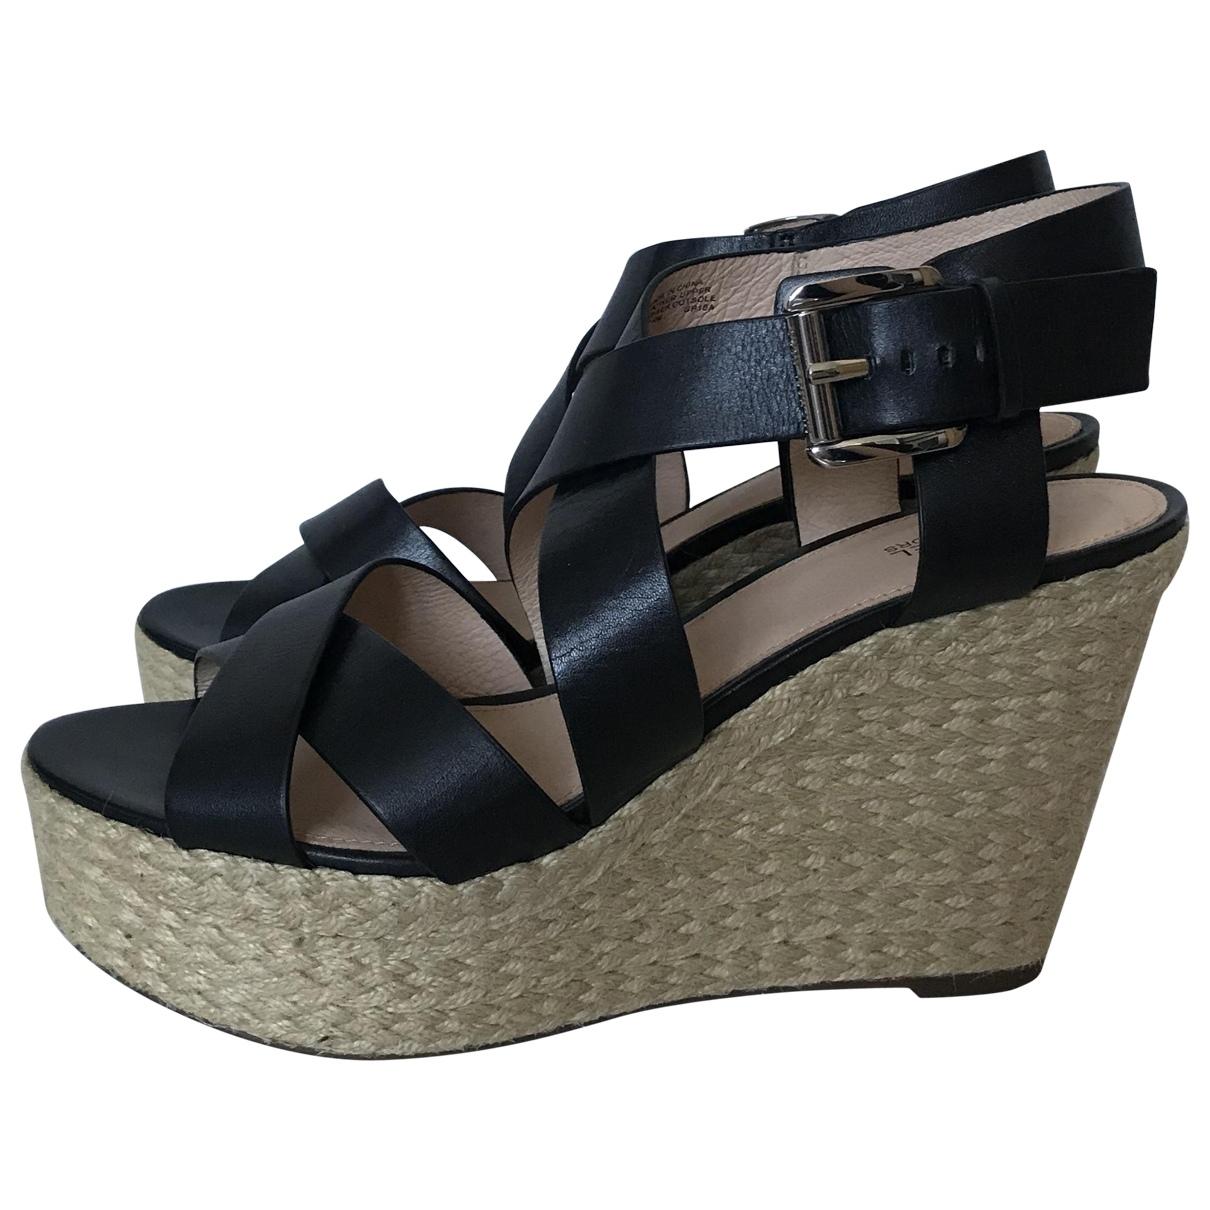 Michael Kors \N Black Leather Sandals for Women 40 EU